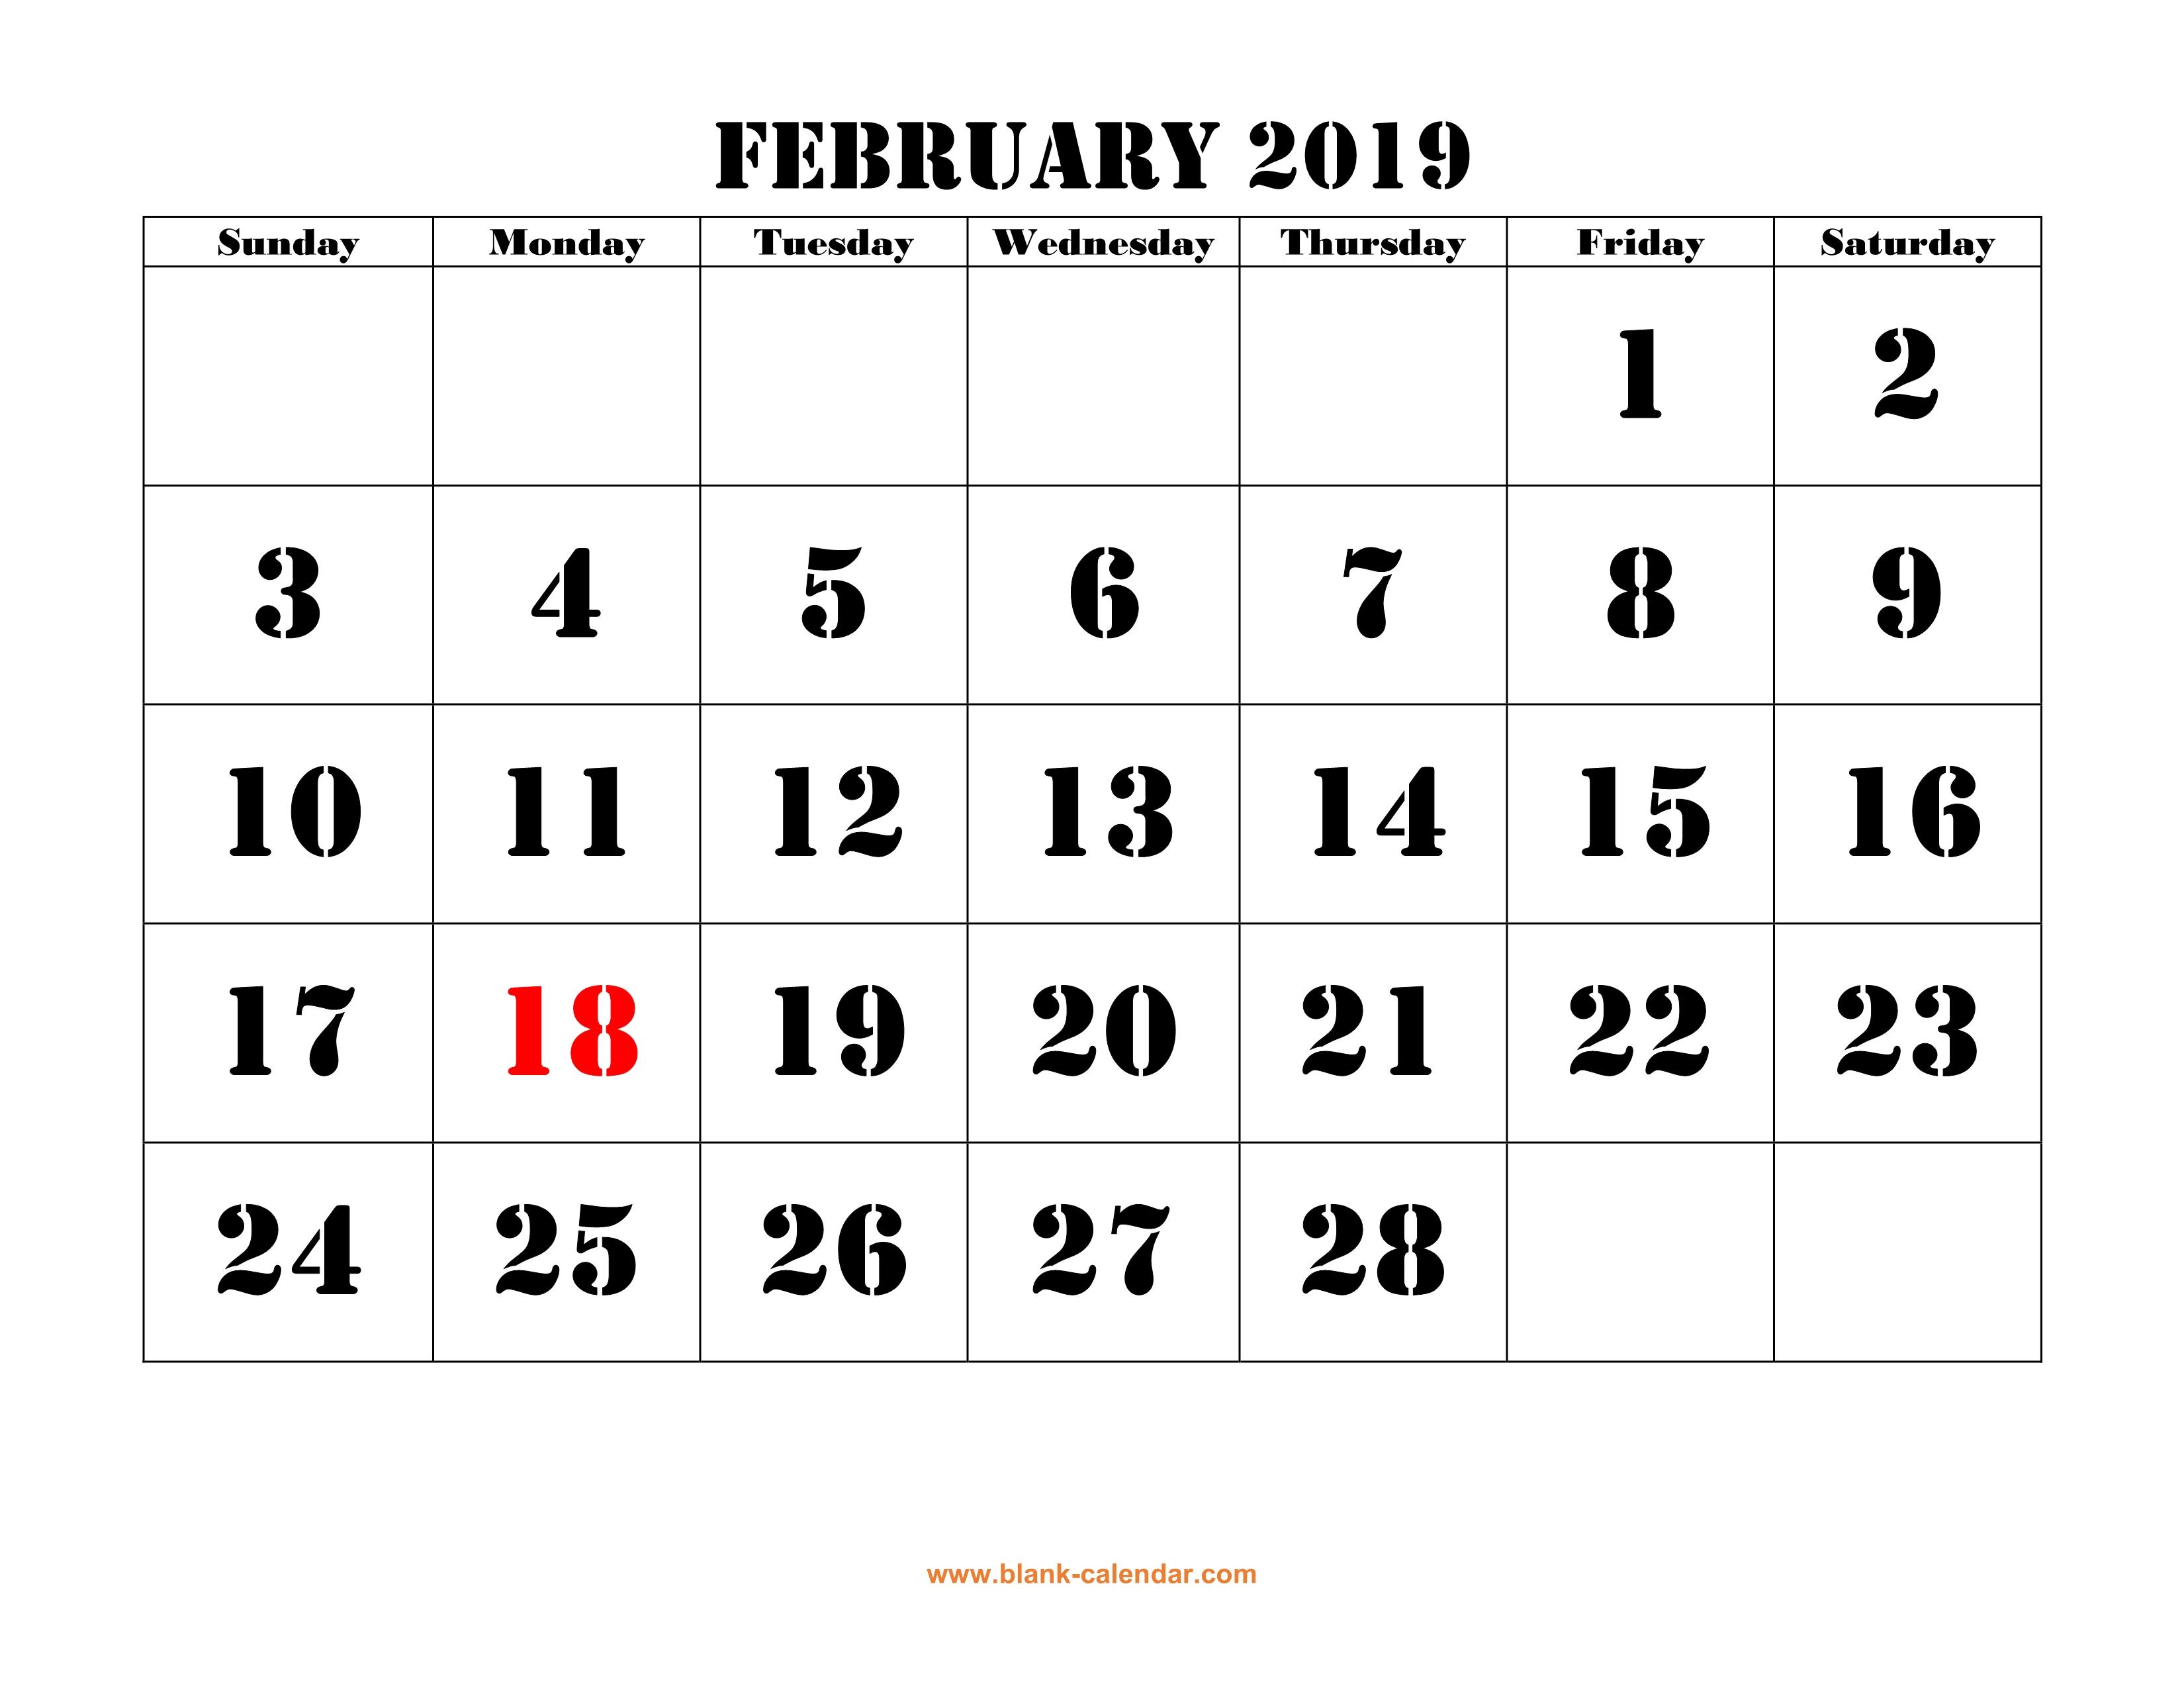 Free Download Printable February 2019 Calendar, Large Font Design intended for Blank Bold December Calendar